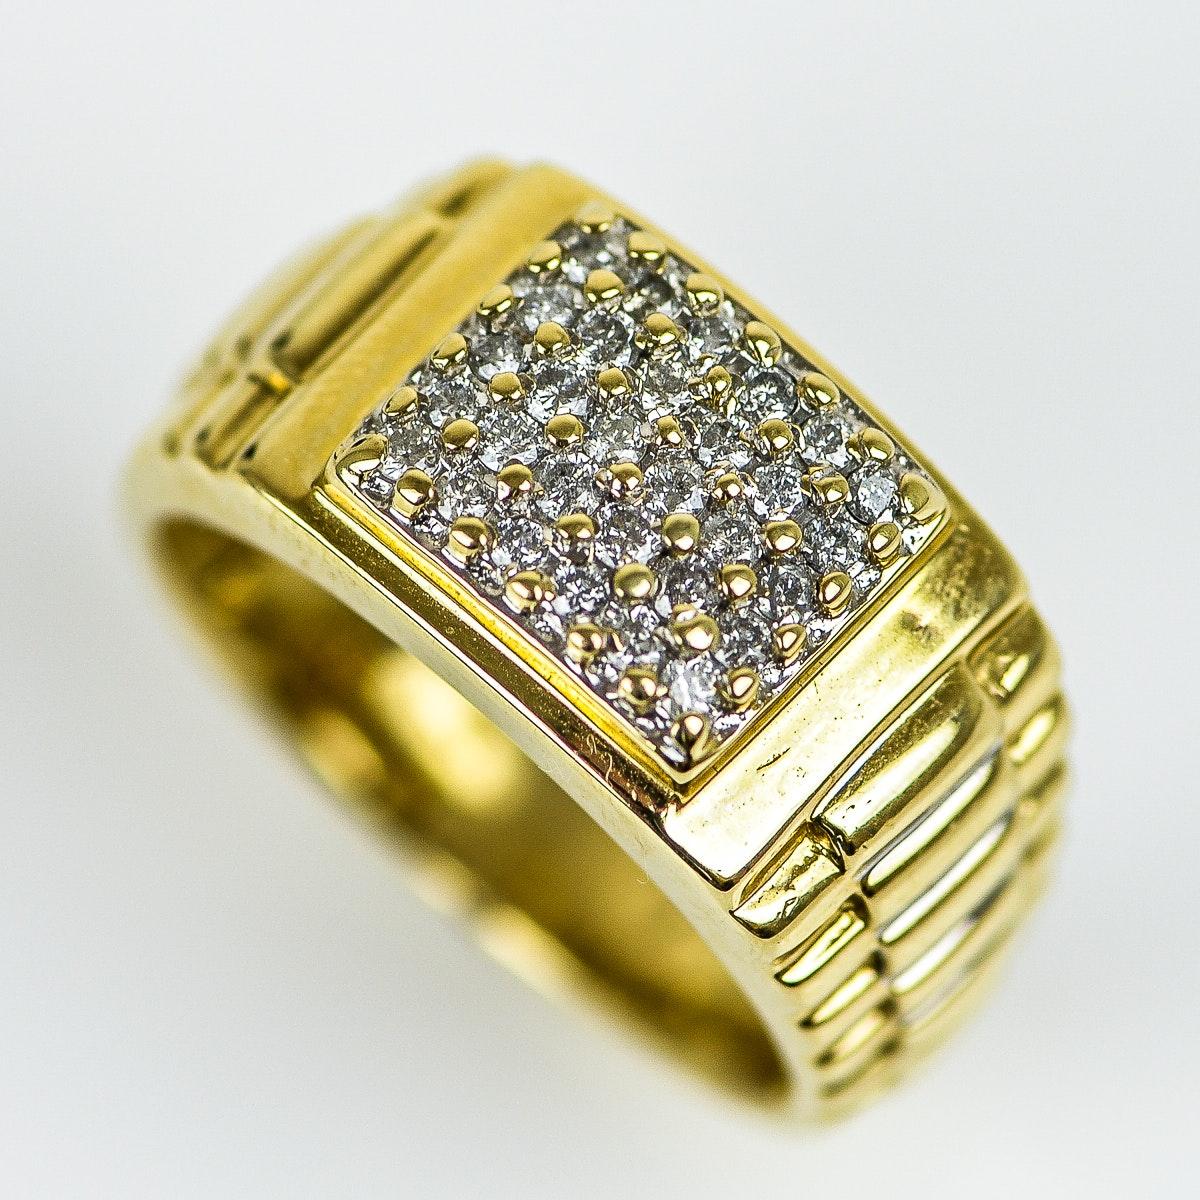 Men's 14K Yellow Gold and Diamond Flat Top Ring